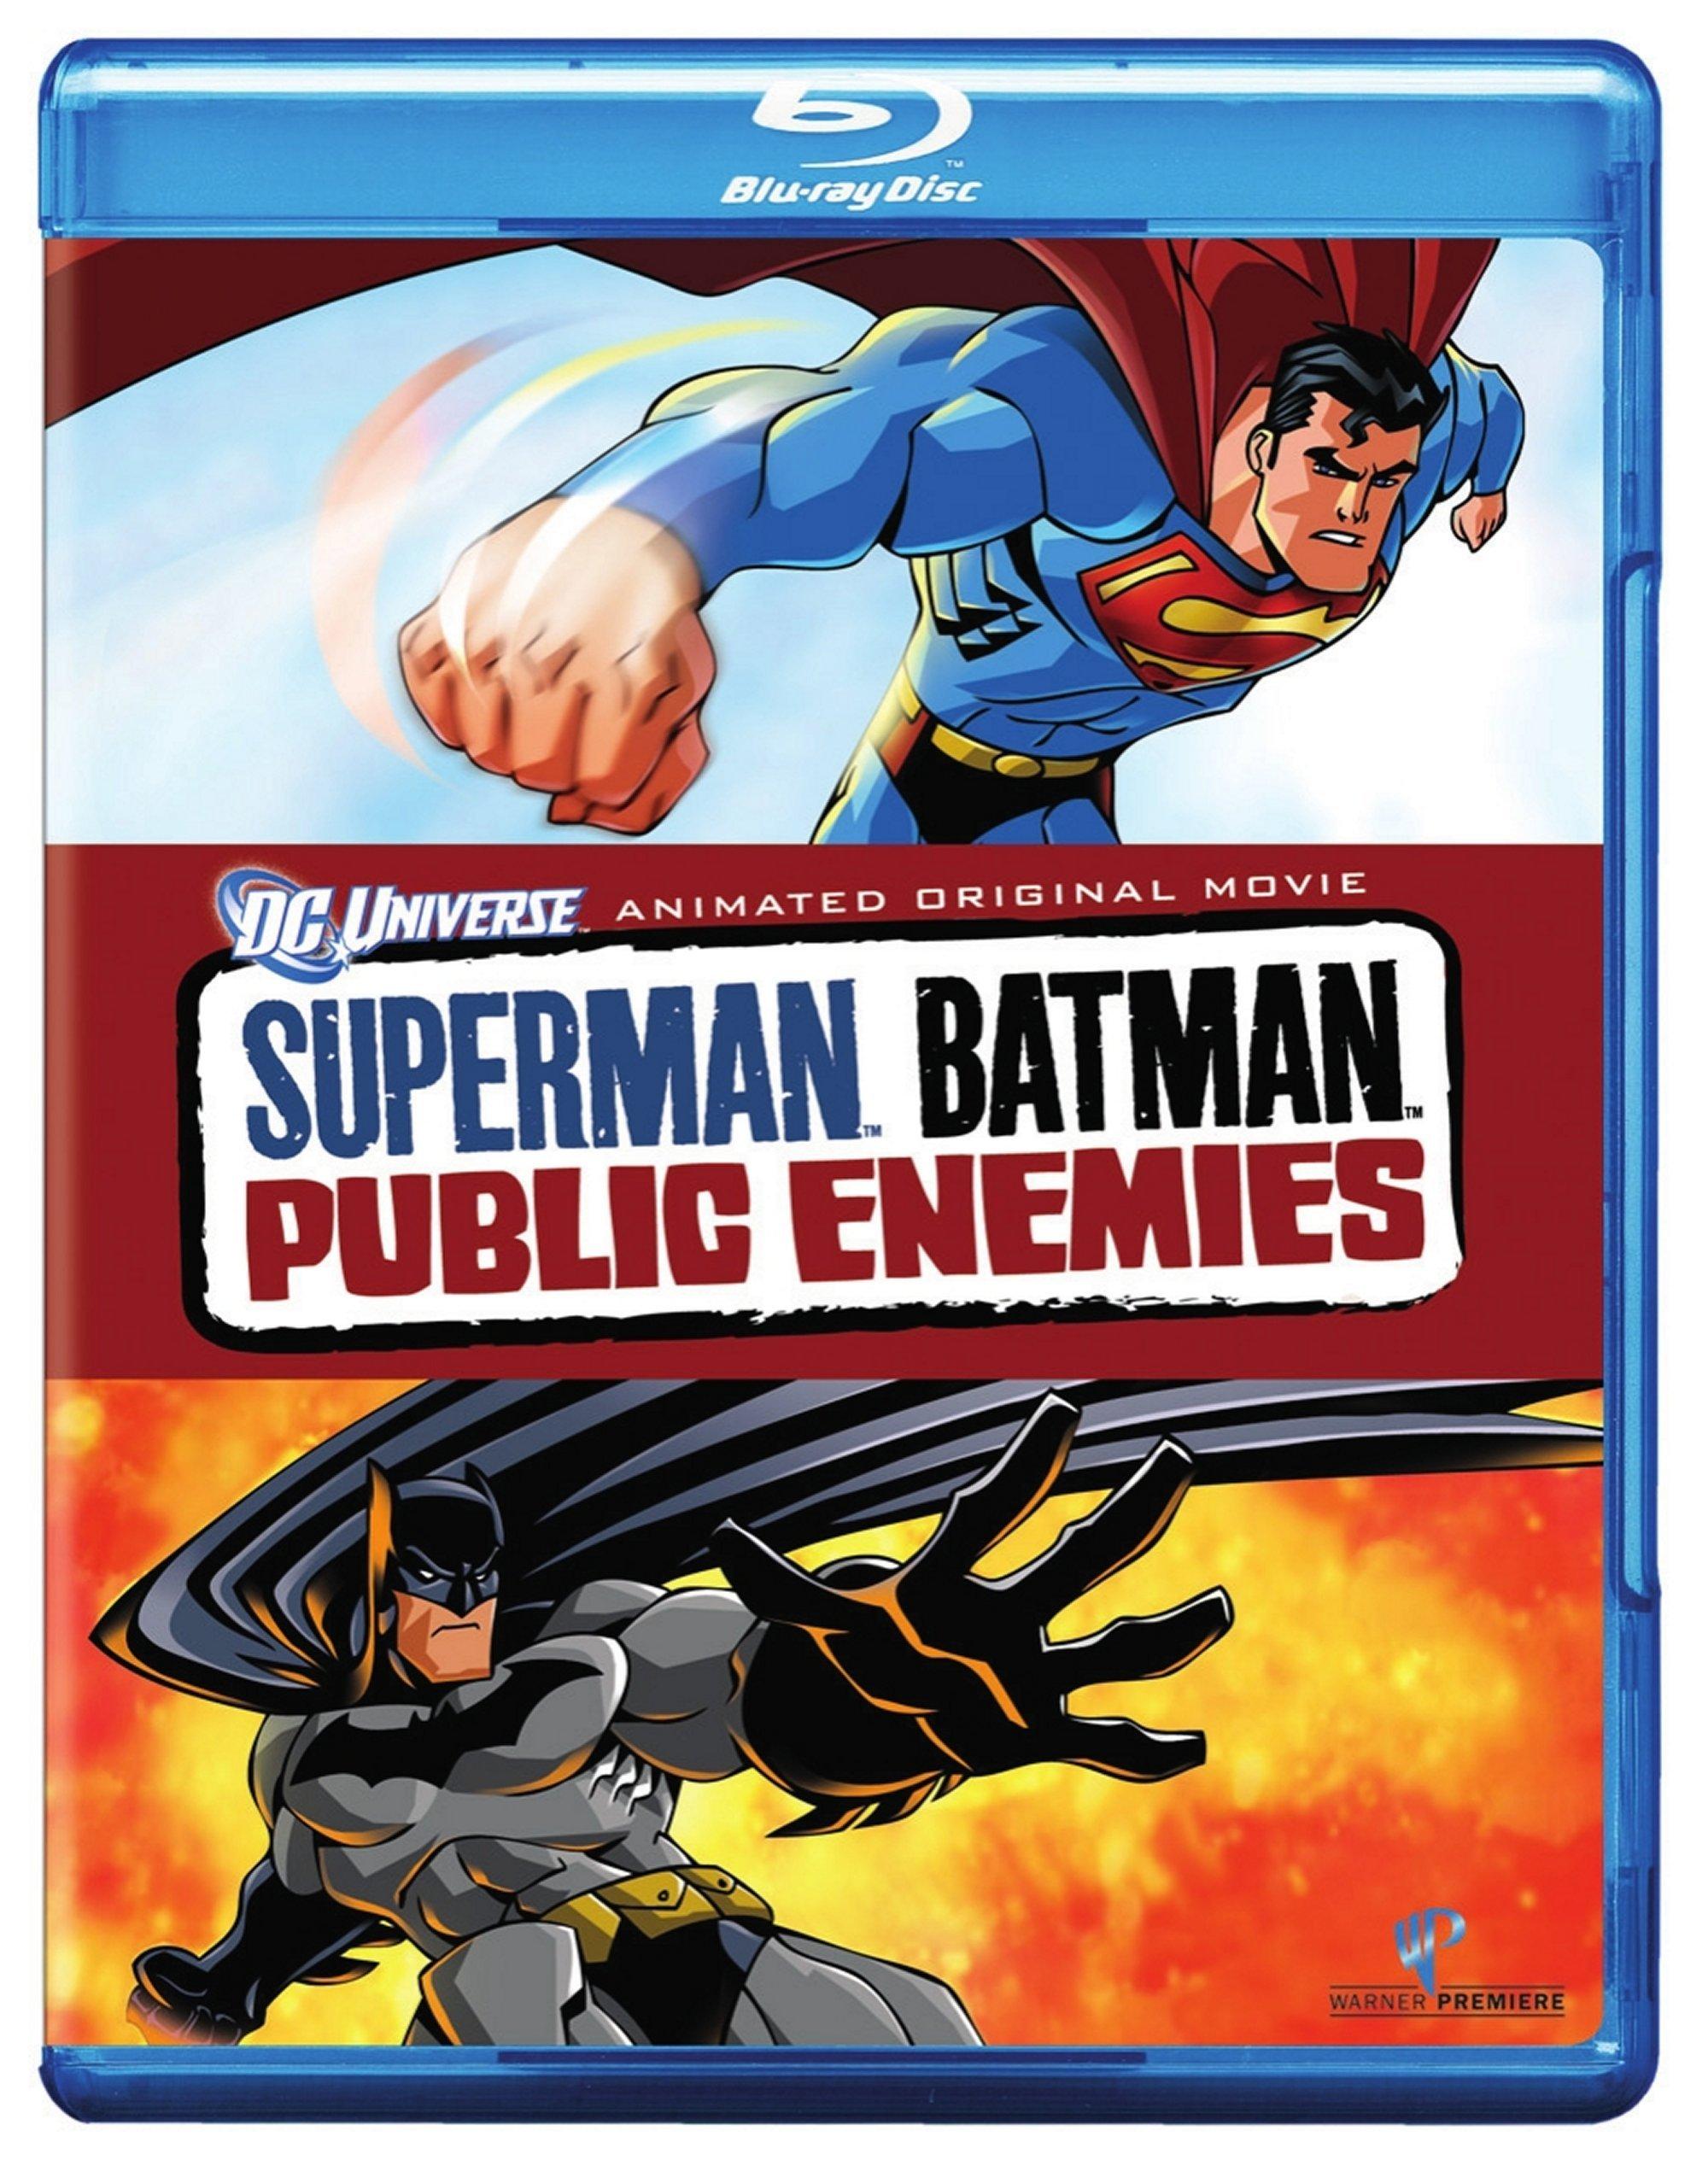 Blu-ray : Superman / Batman: Public Enemies (Widescreen, Dolby, AC-3, Dubbed, O-Card Packaging)